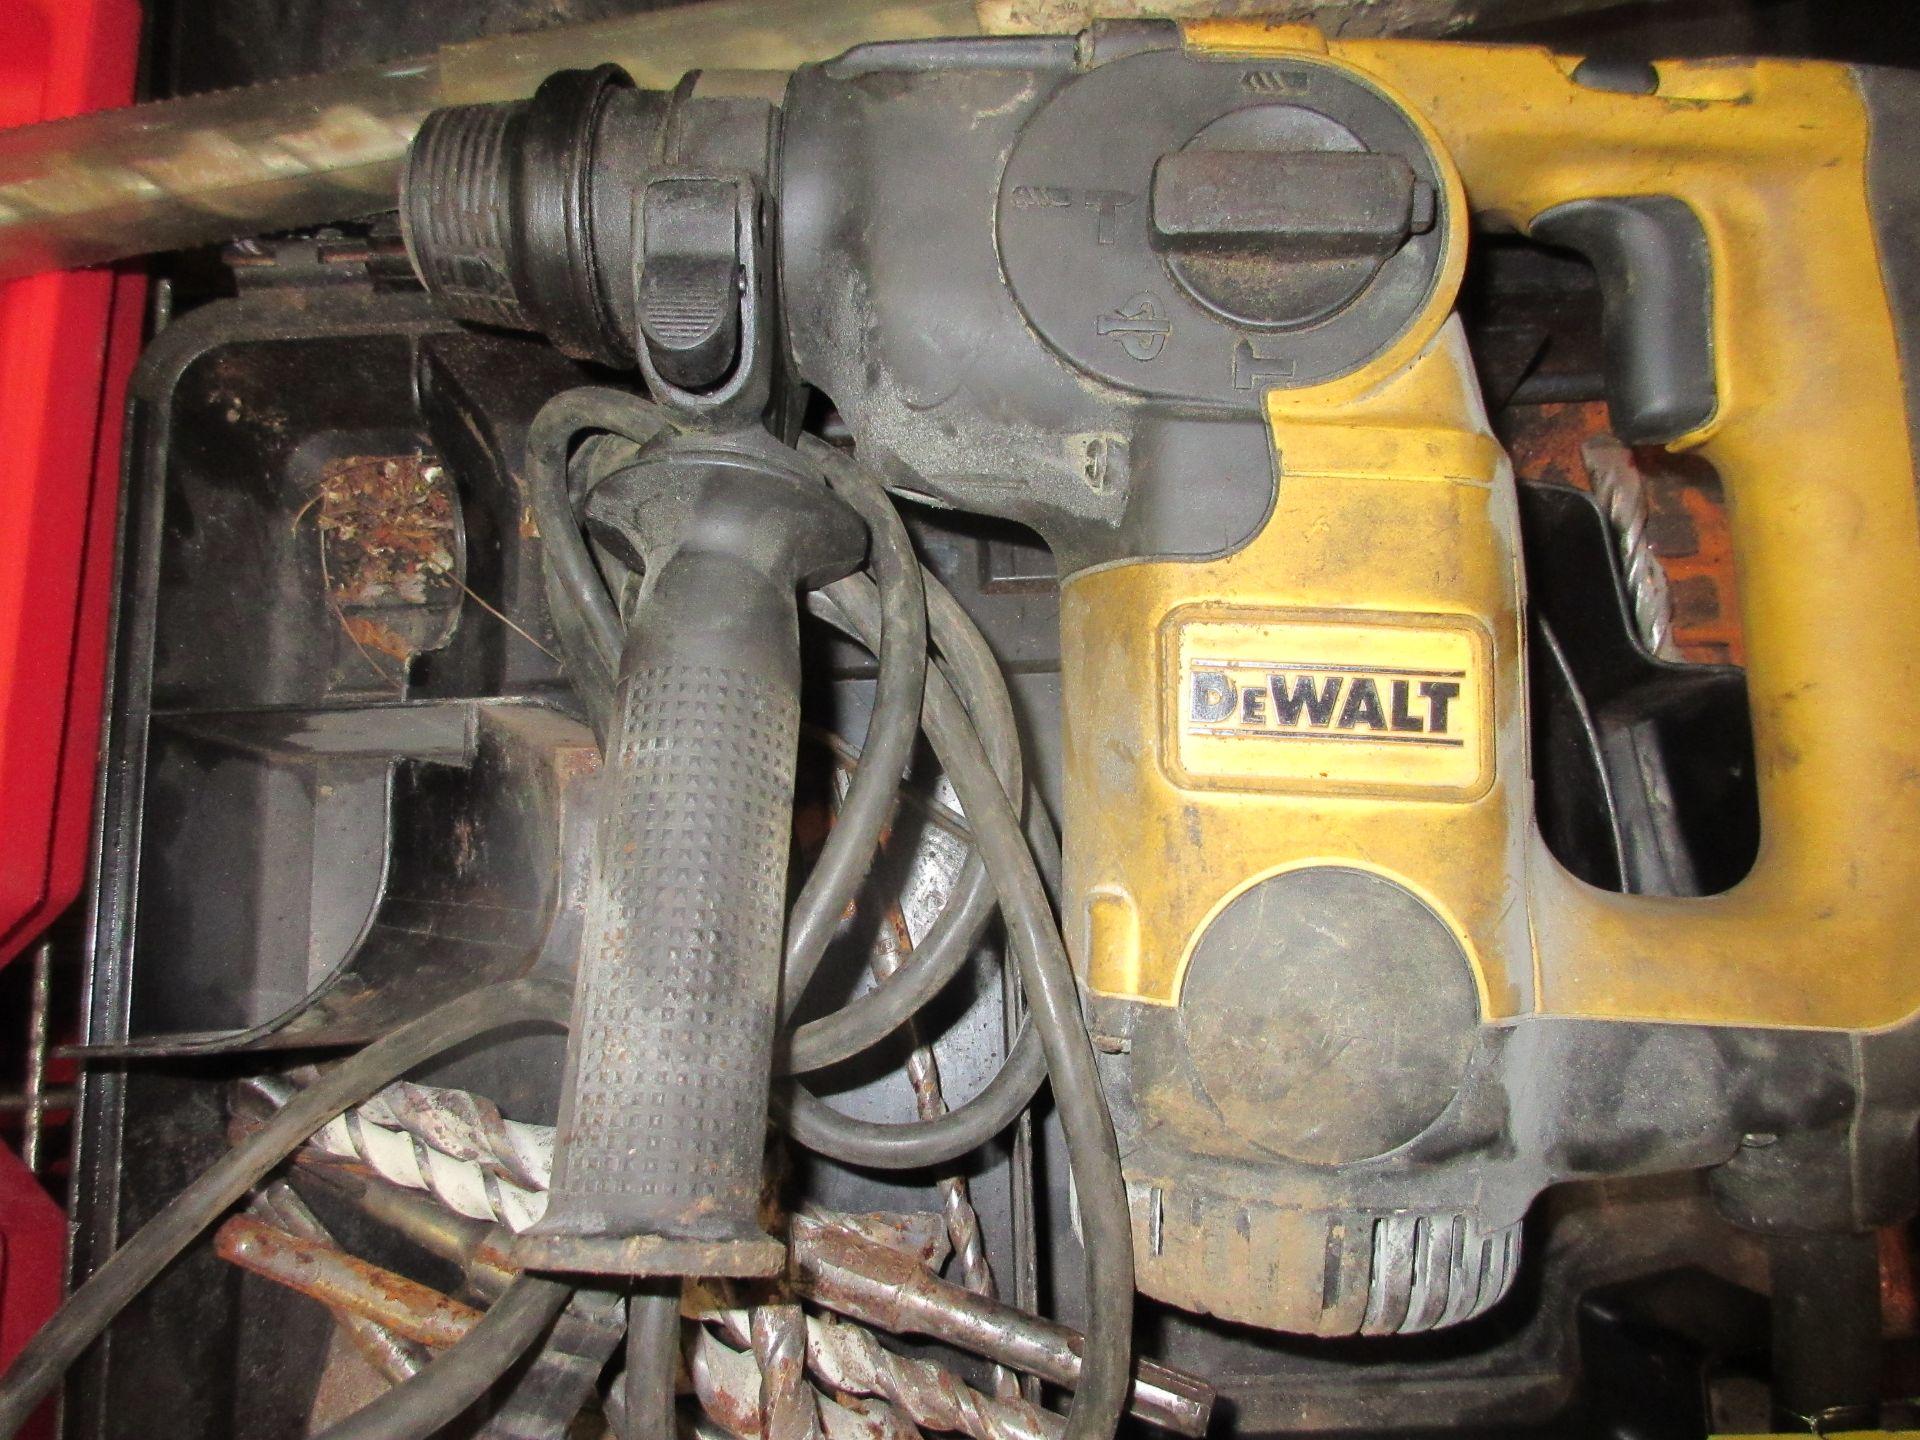 (1) DEWALT D25303 Rotary Hammer - Image 2 of 2